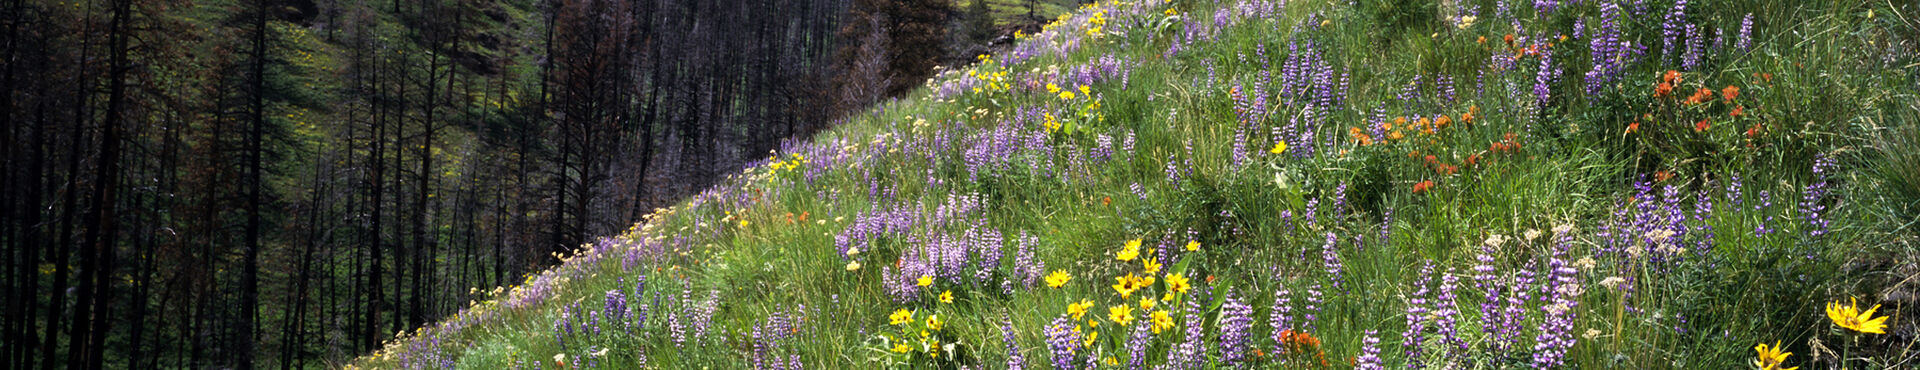 Banner - Cascadia Wildlands